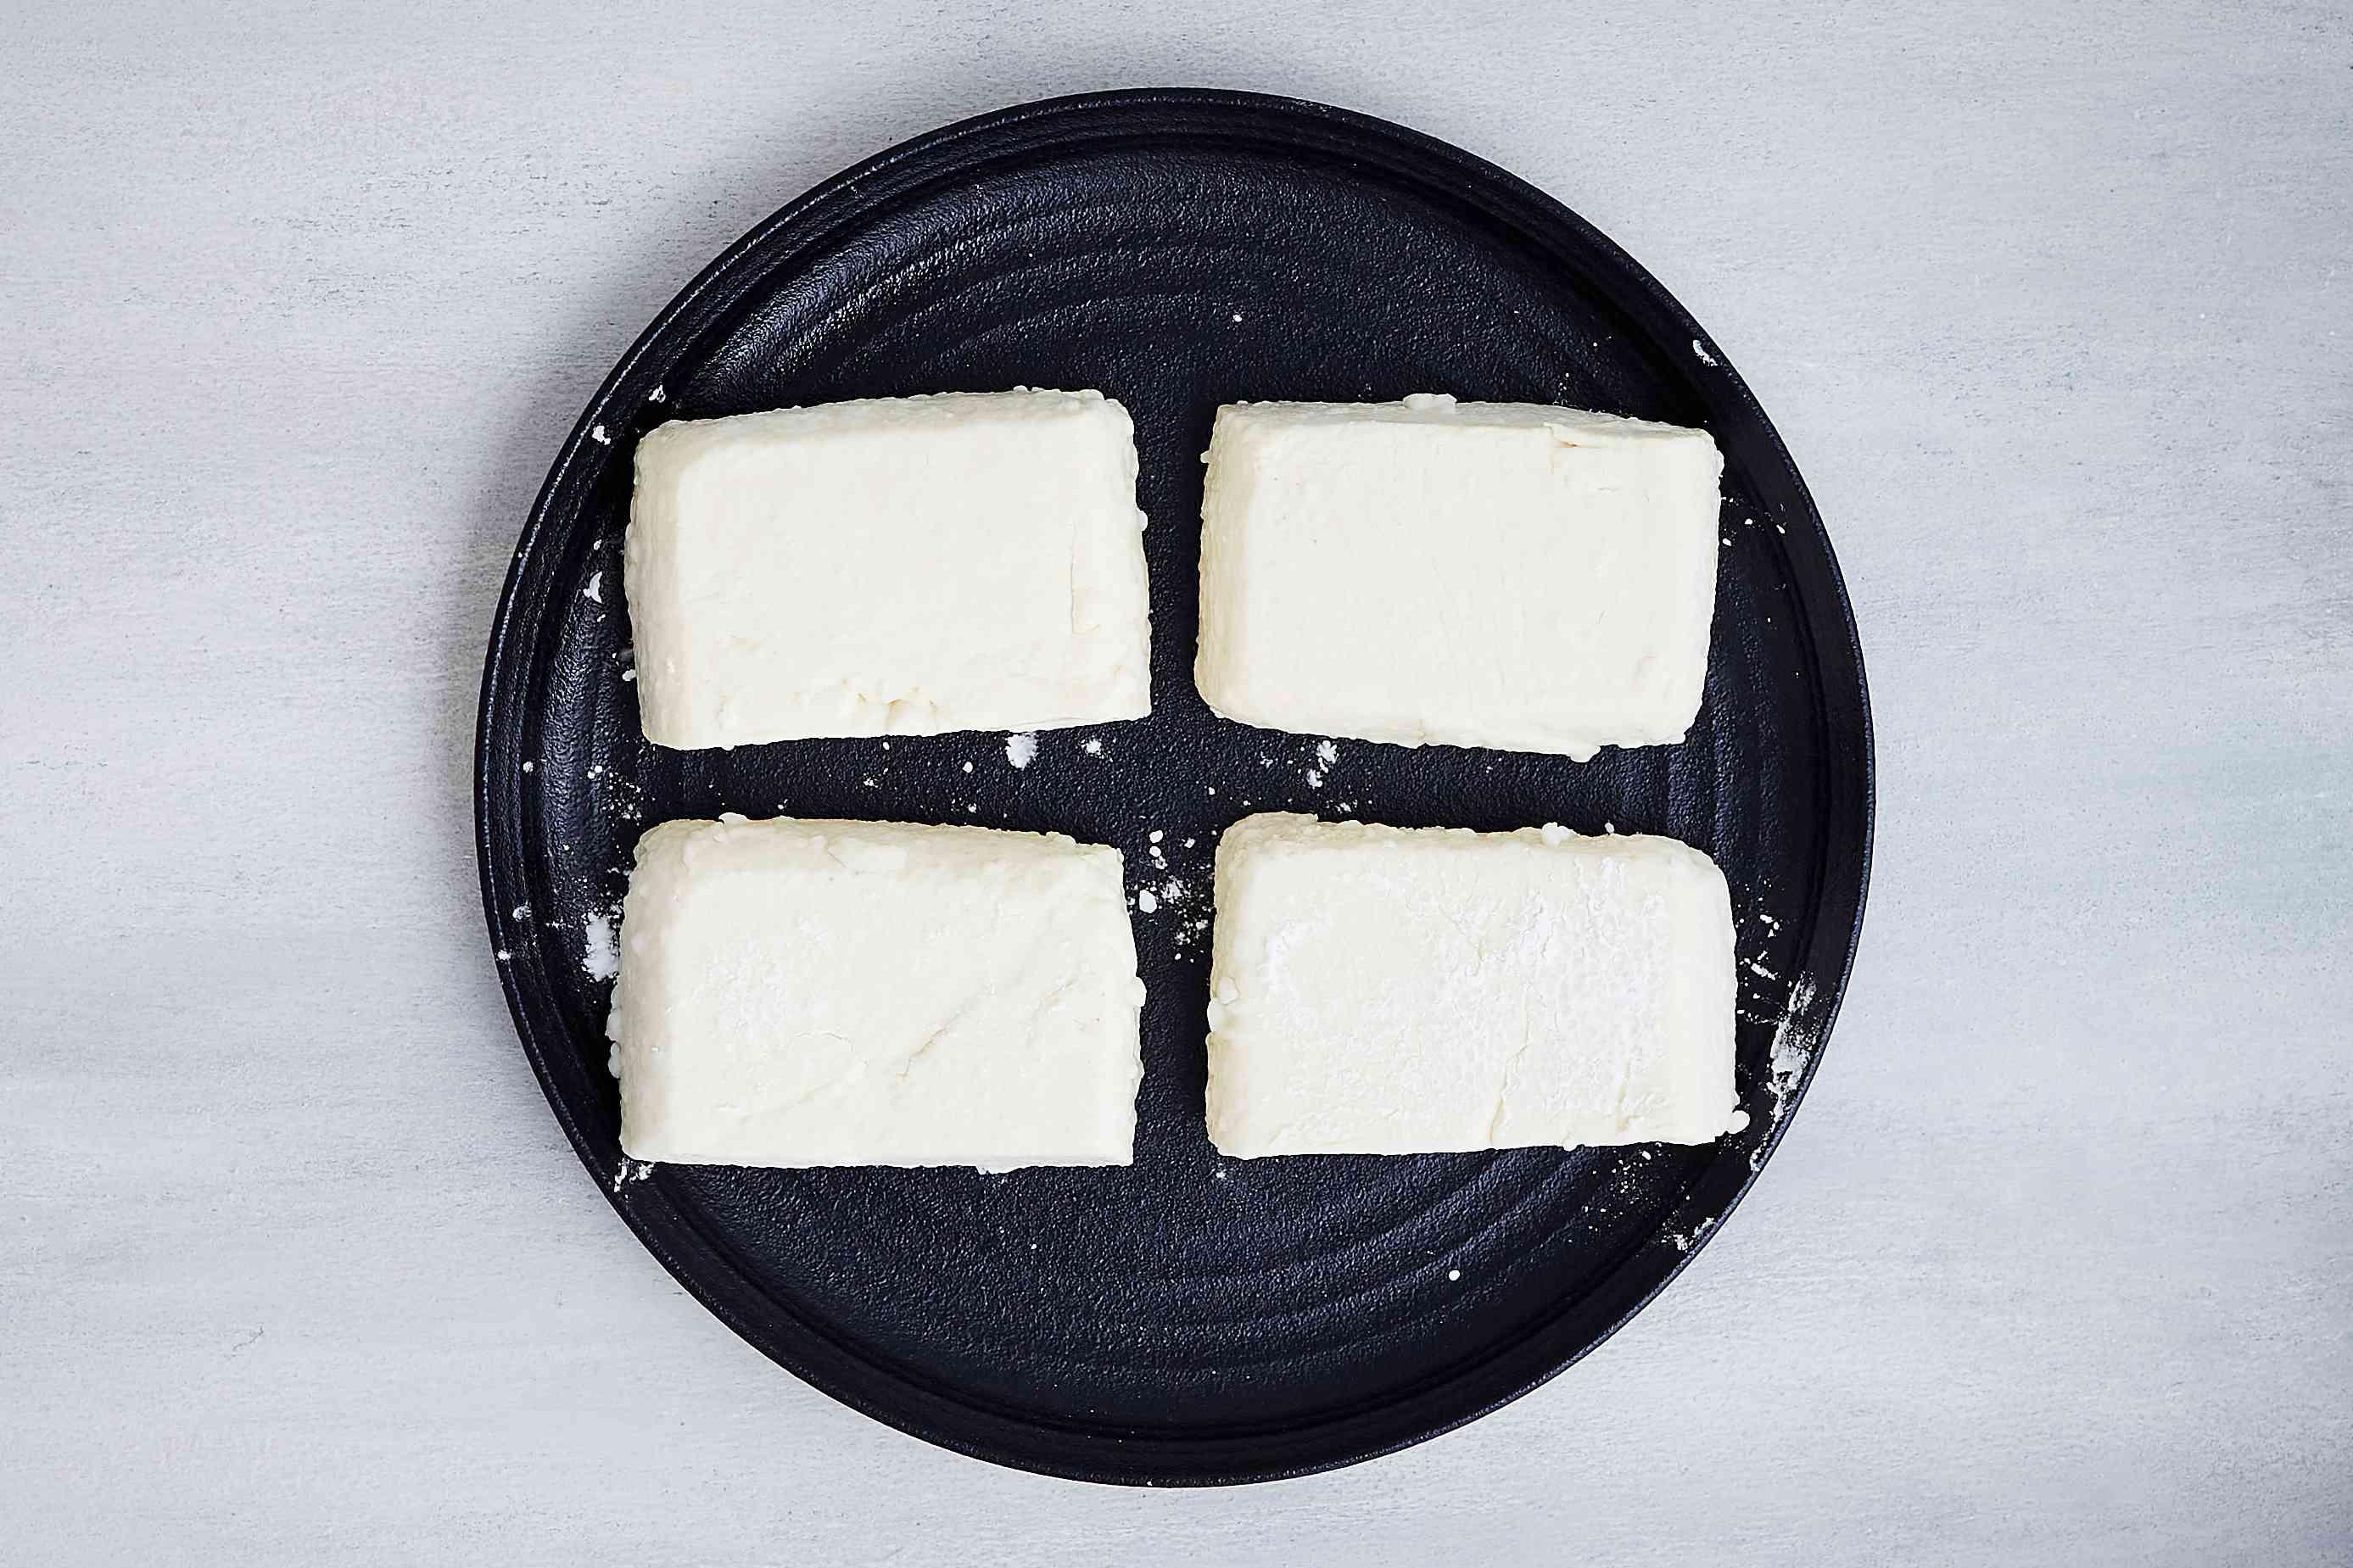 tofu dusted with katakuriko starch